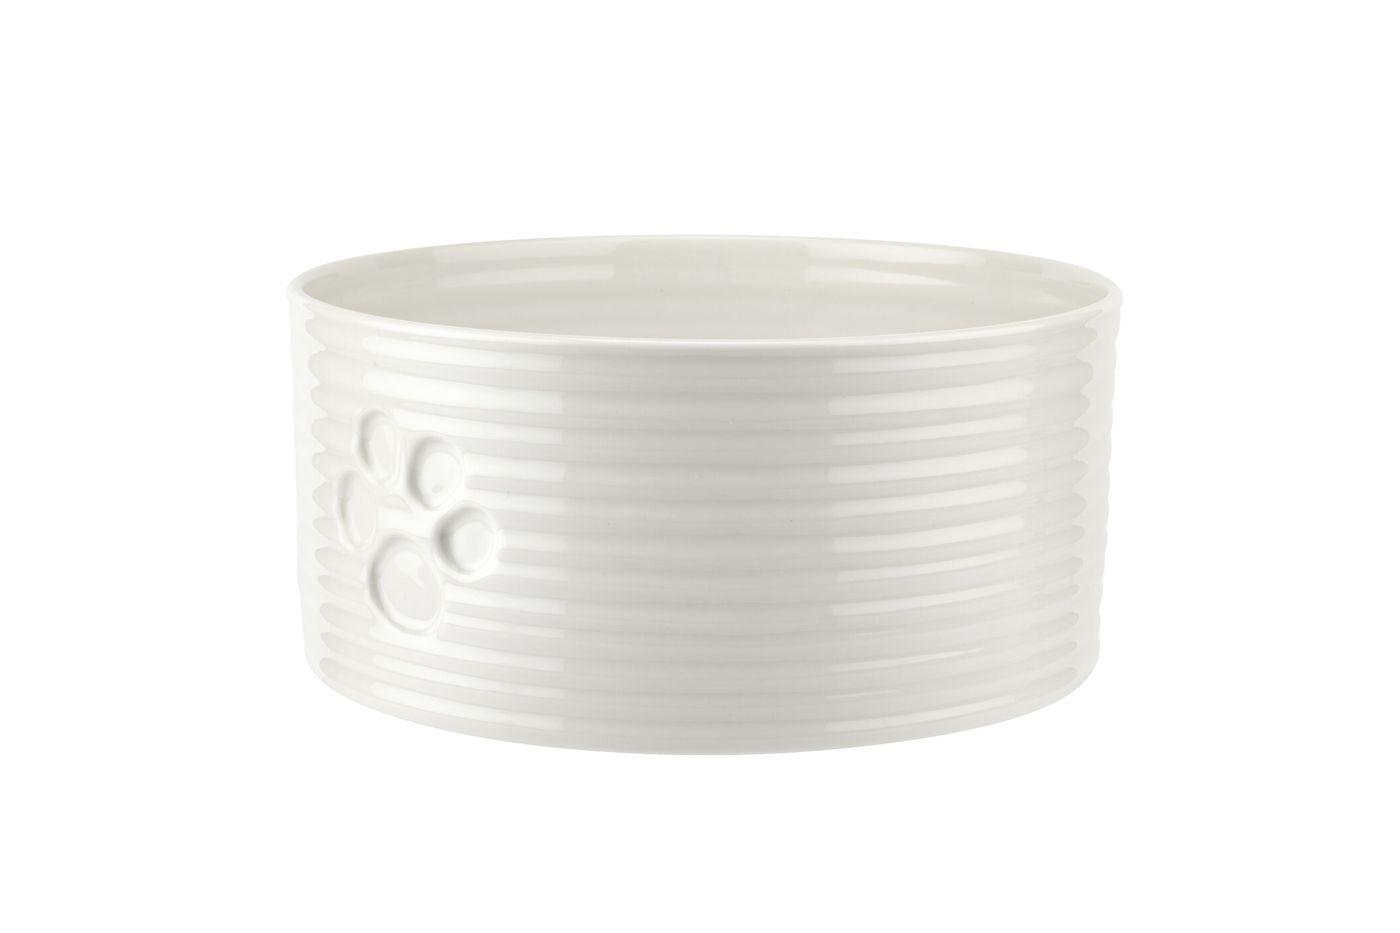 Sophie Conran for Portmeirion White Pet Bowl 19.5cm thumb 3